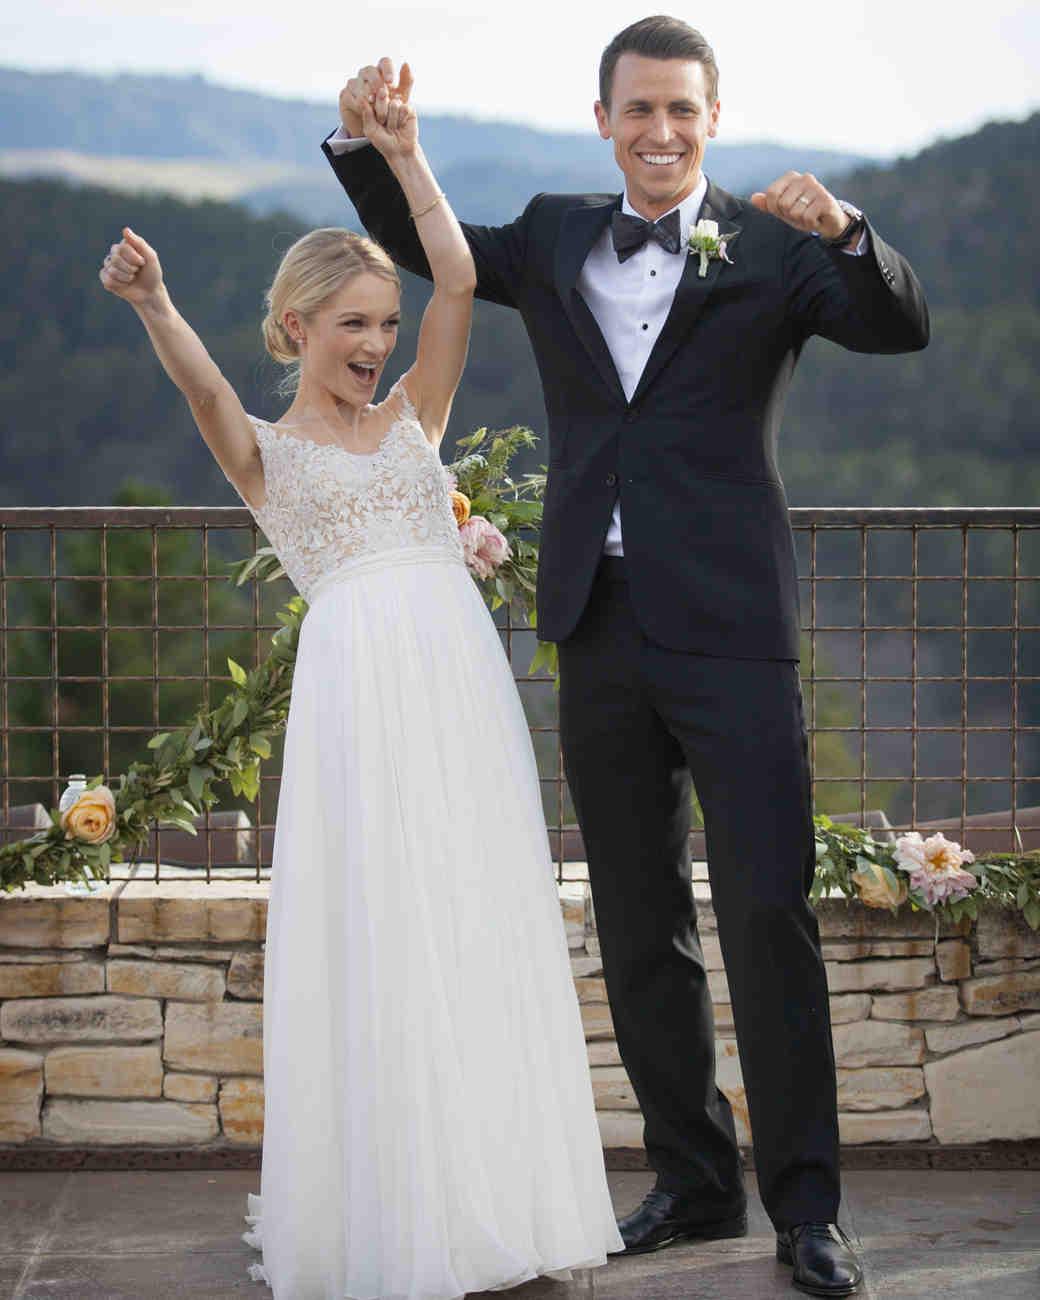 kristin-chris-wedding-couple-327-s112398-0116.jpg